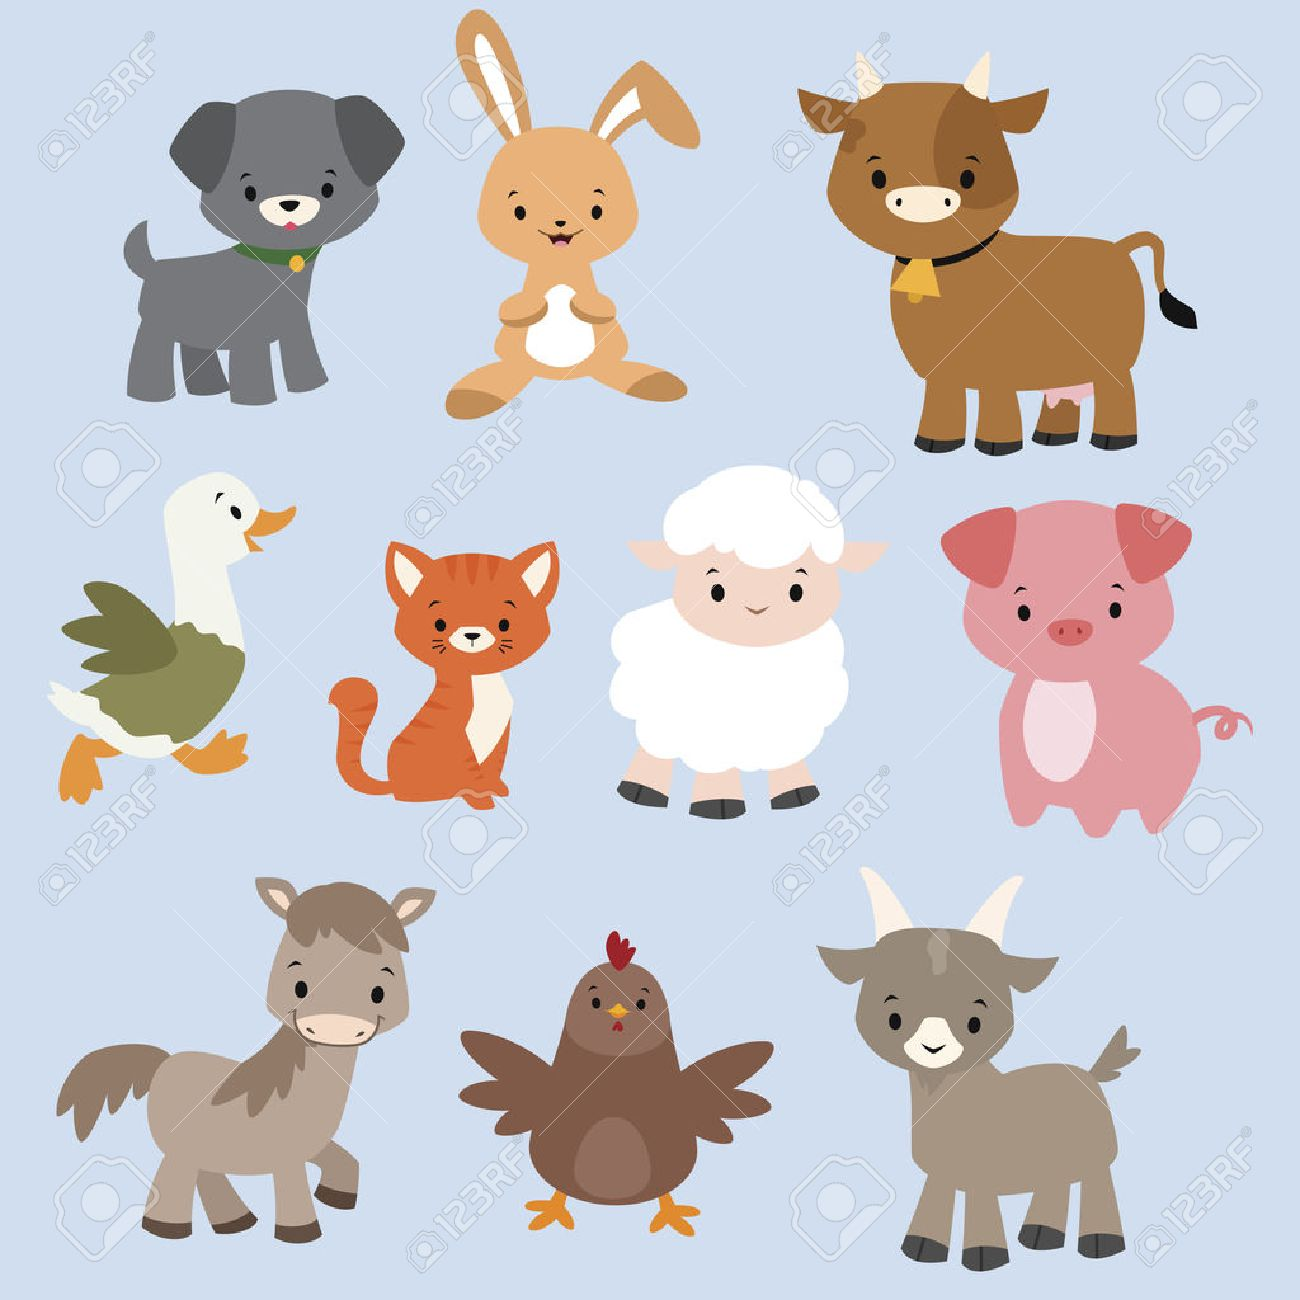 A set of cute cartoon farm animals.